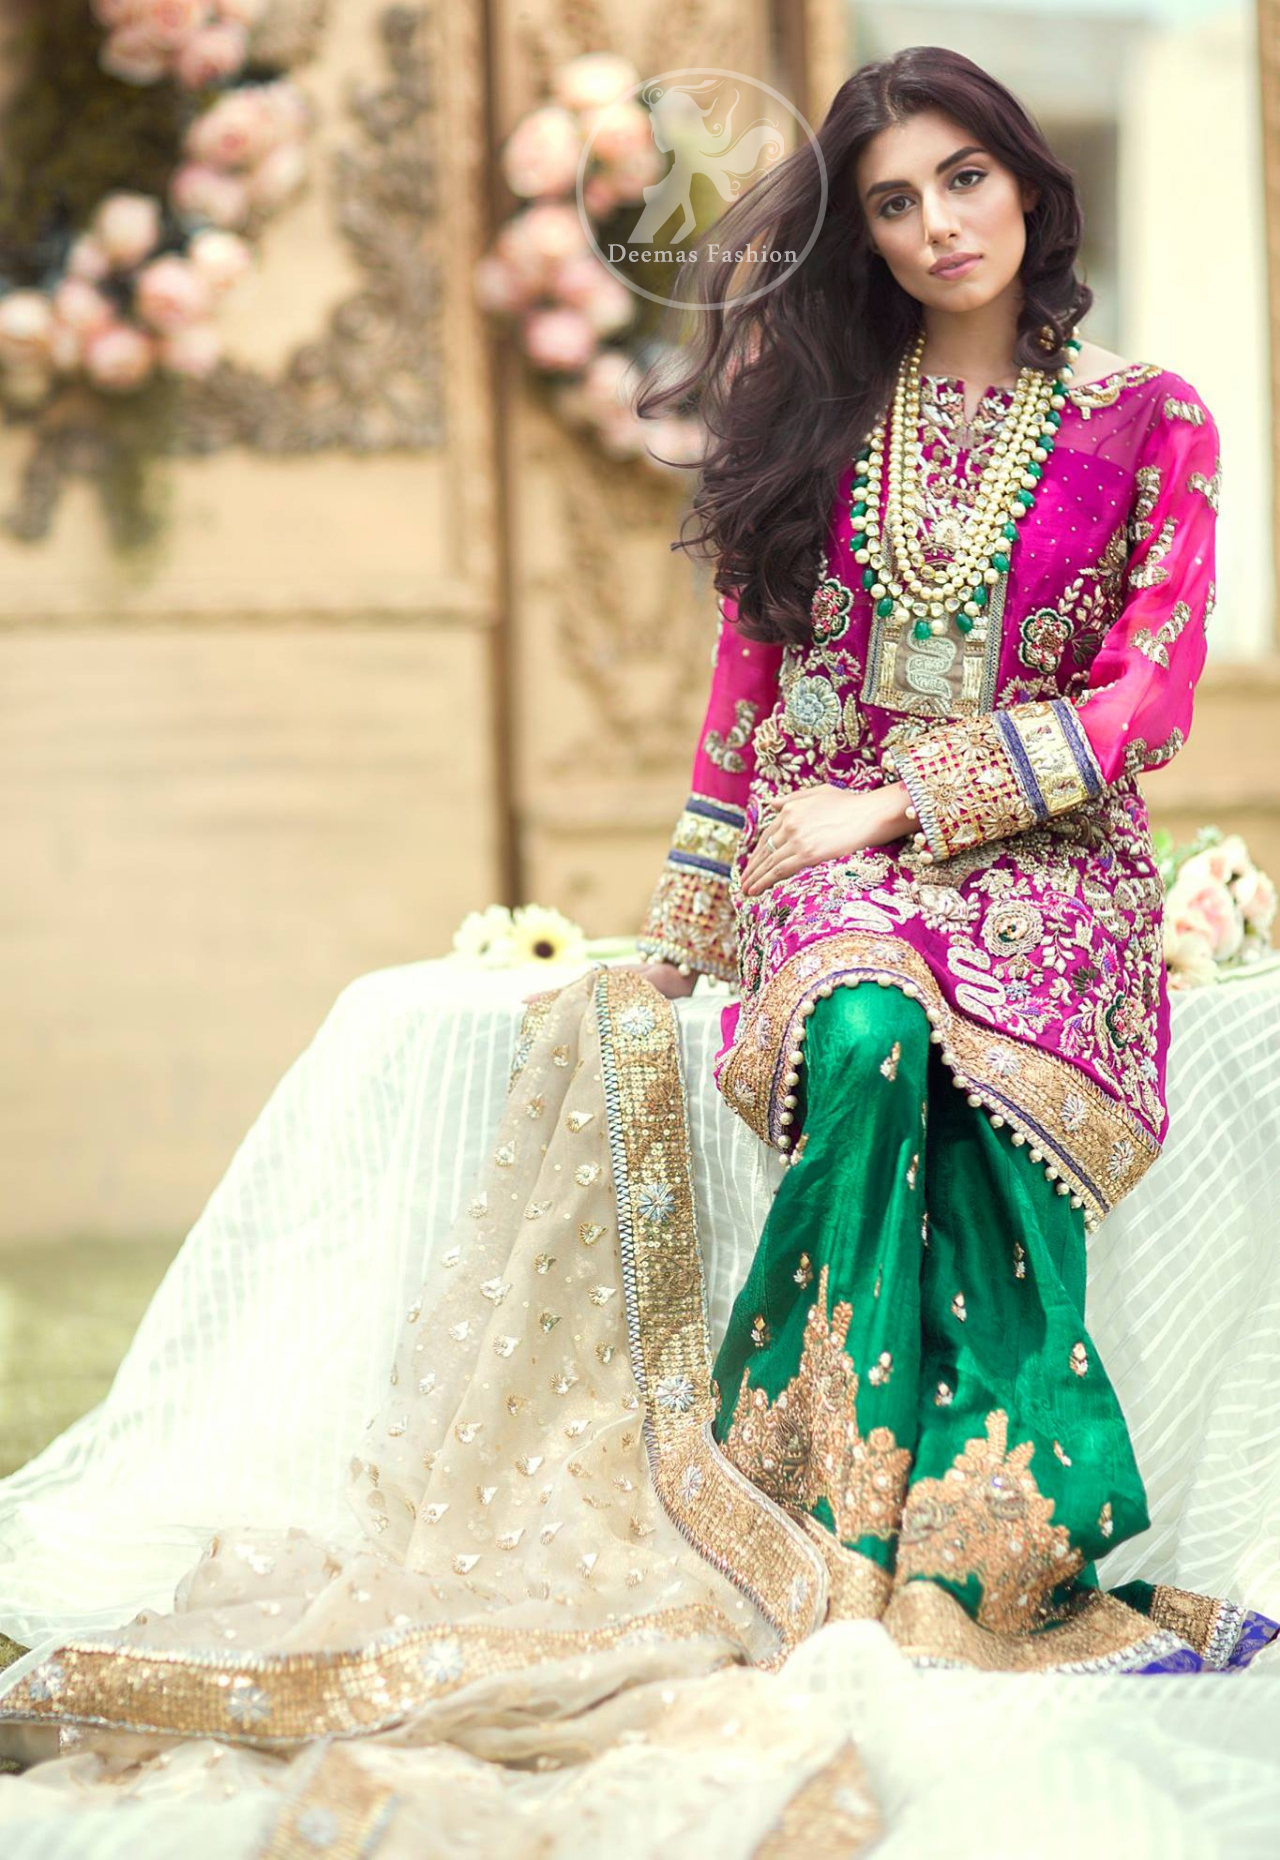 Mehndi Dresses 2017 - Shocking Pink Shirt - Bottle Green Sharara - Beige Dupatta